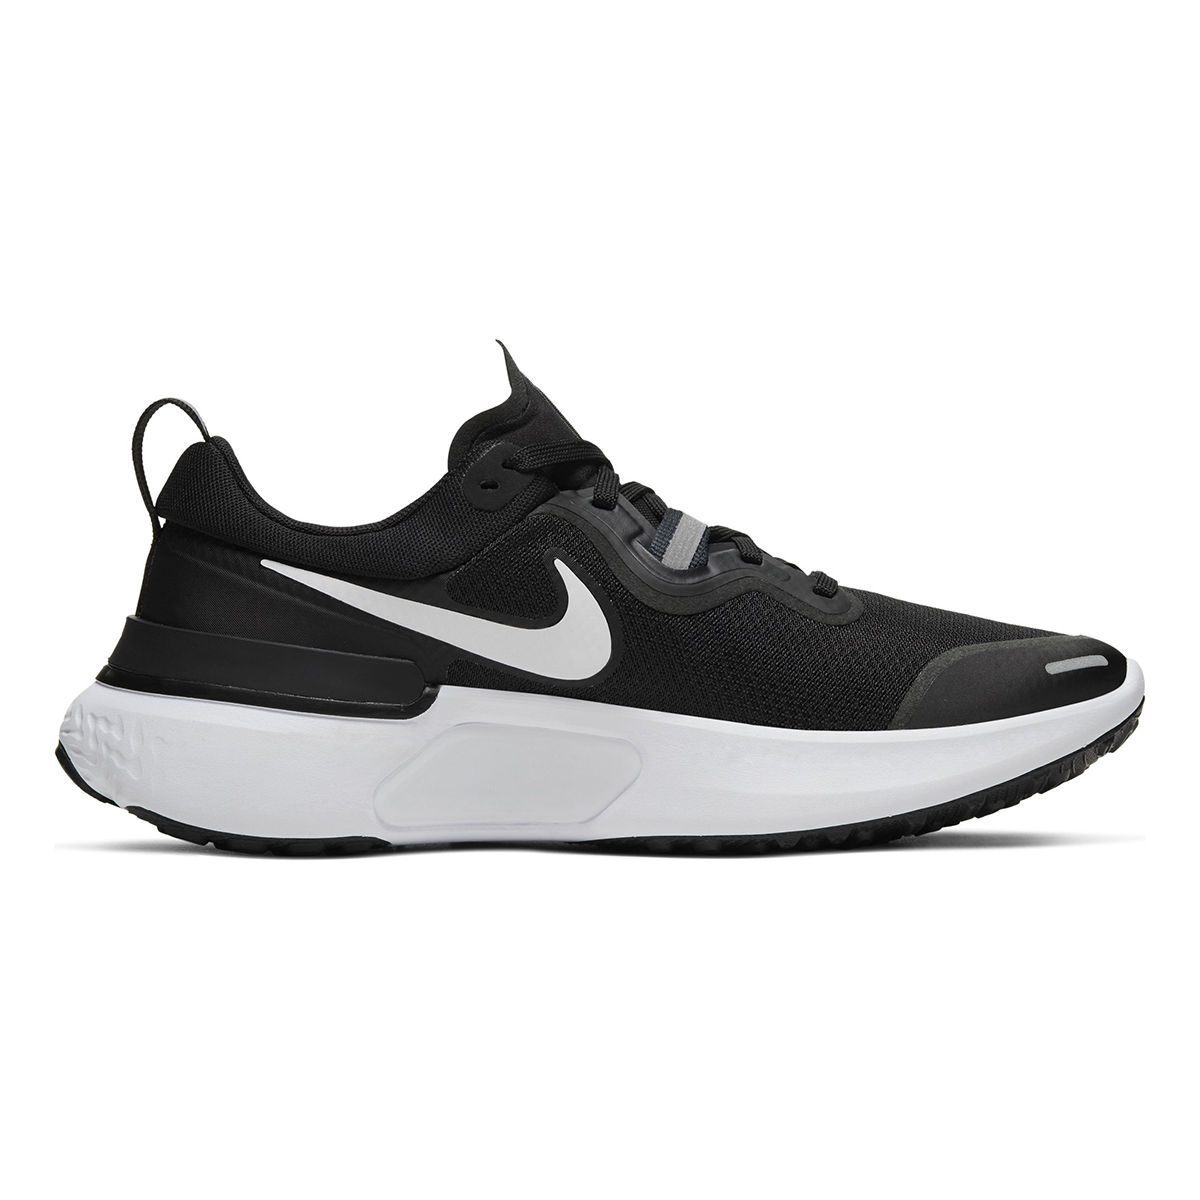 Women's Nike React Miler Running Shoe - Color: Black/Dark Grey/Anthracite/White (Regular Width) - Size: 5, Black/Dark Grey/Anthracite/White, large, image 1